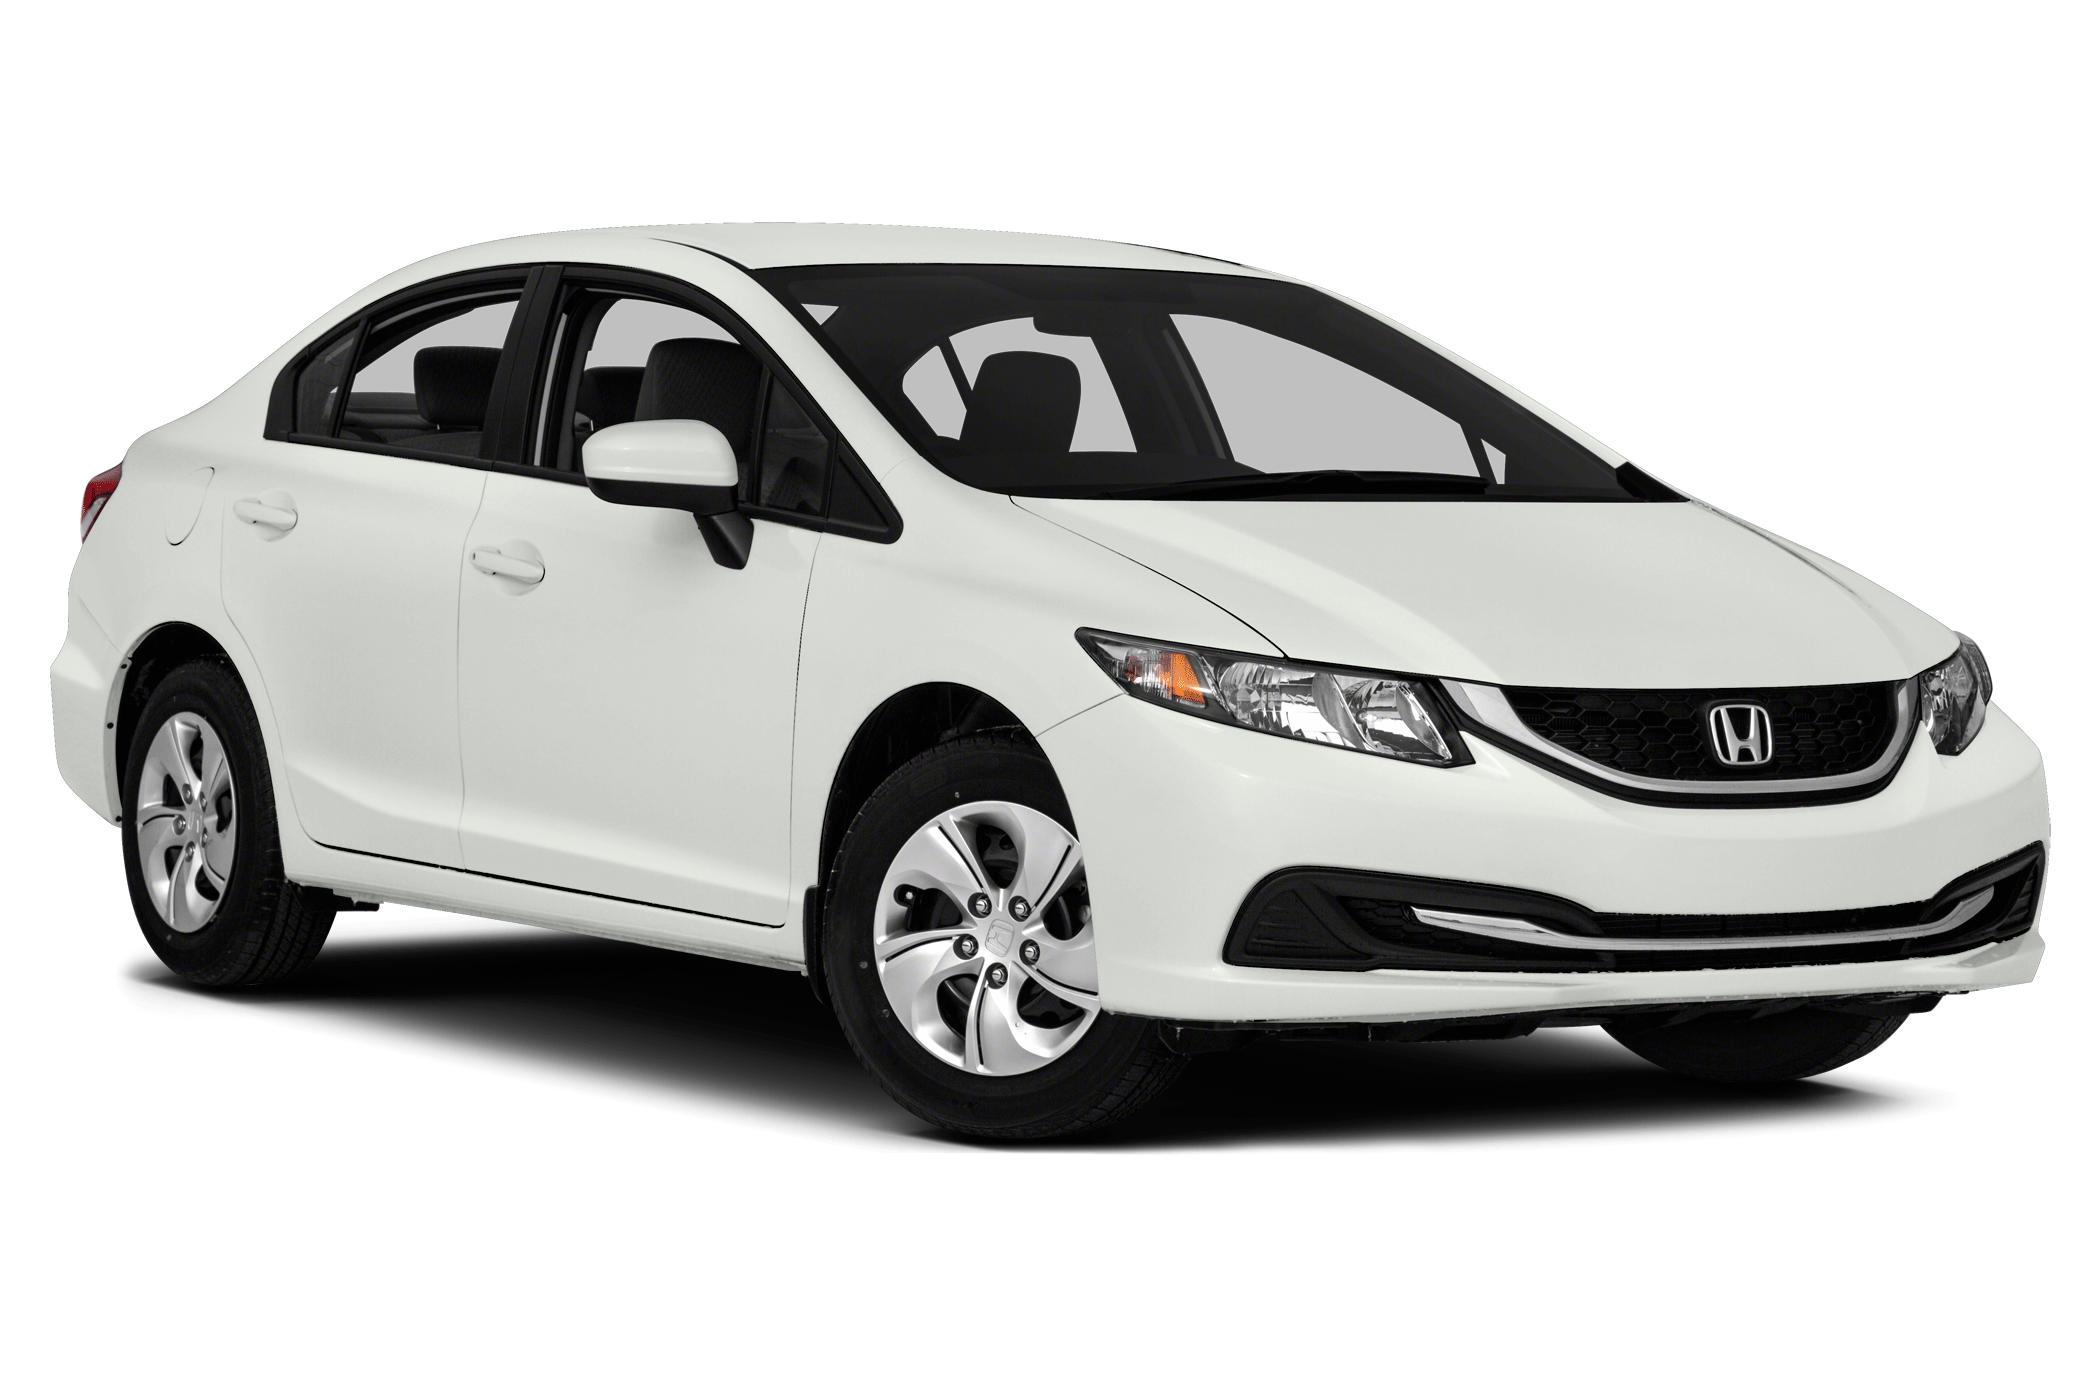 Download Honda Cars PNG Image for Free.